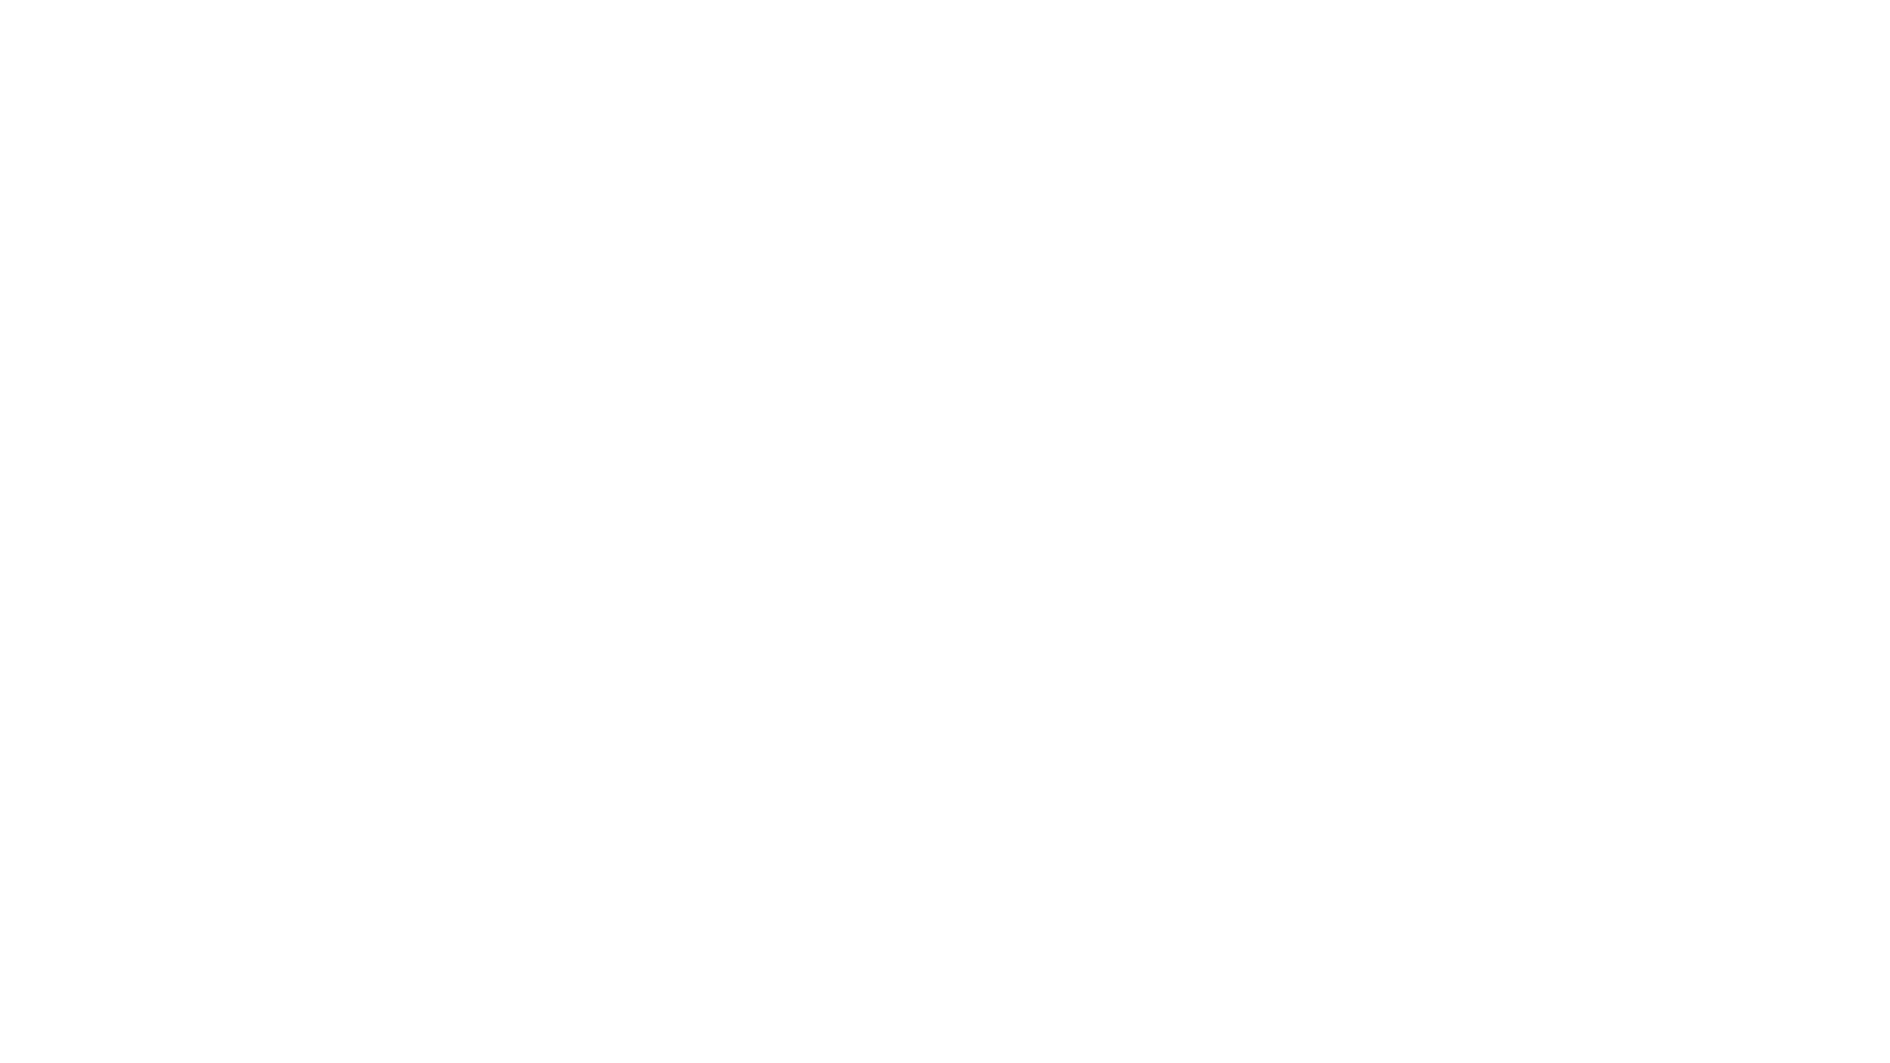 Logo-doc-12.png